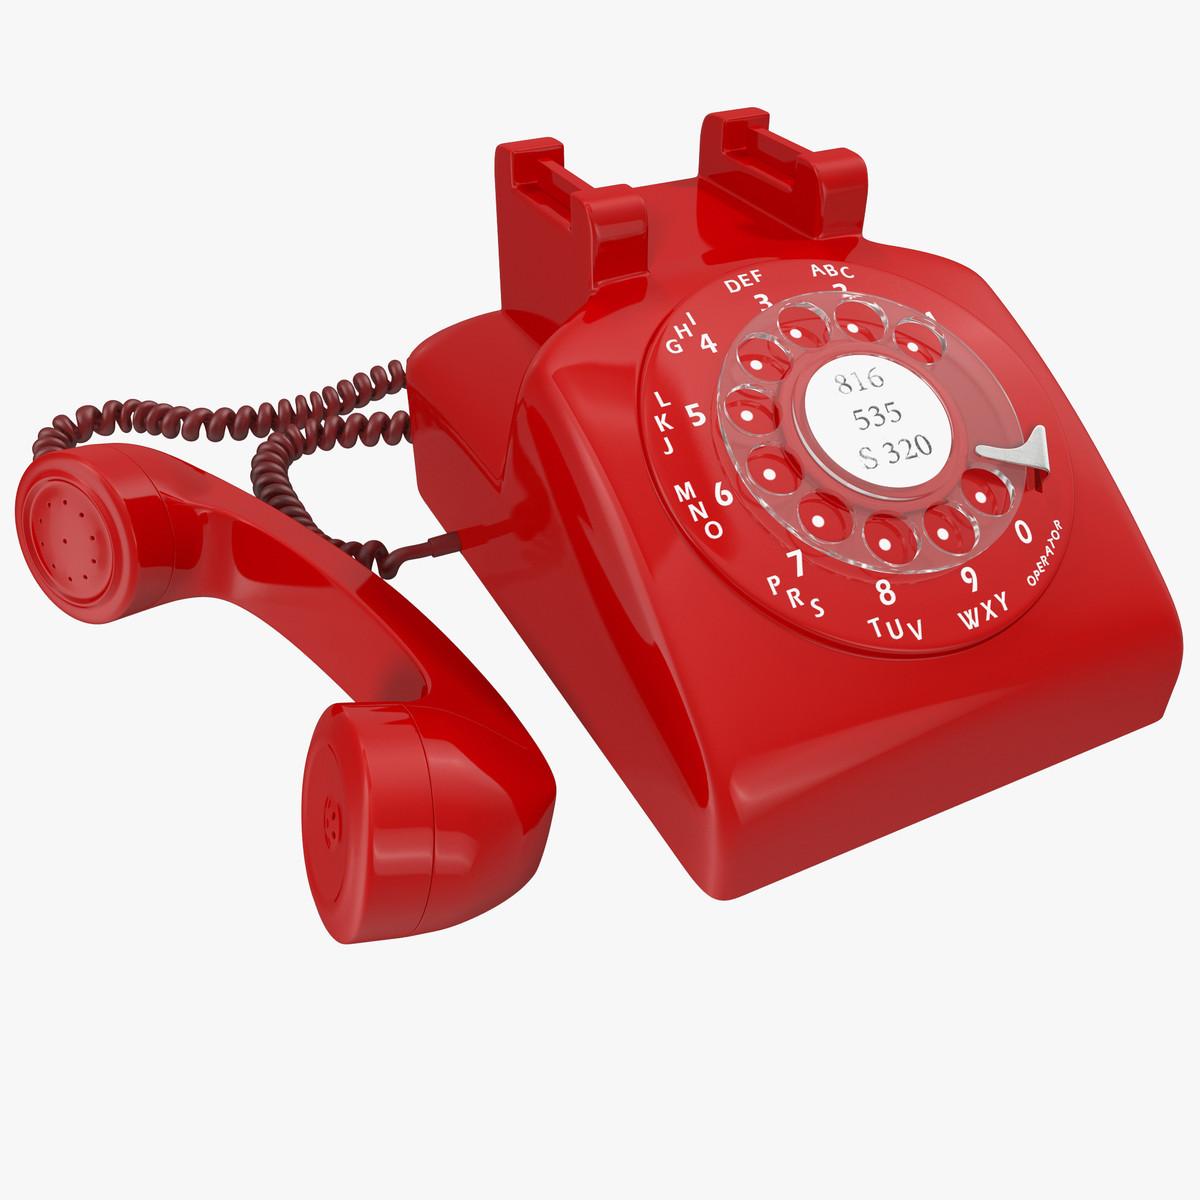 red rotary phone obj